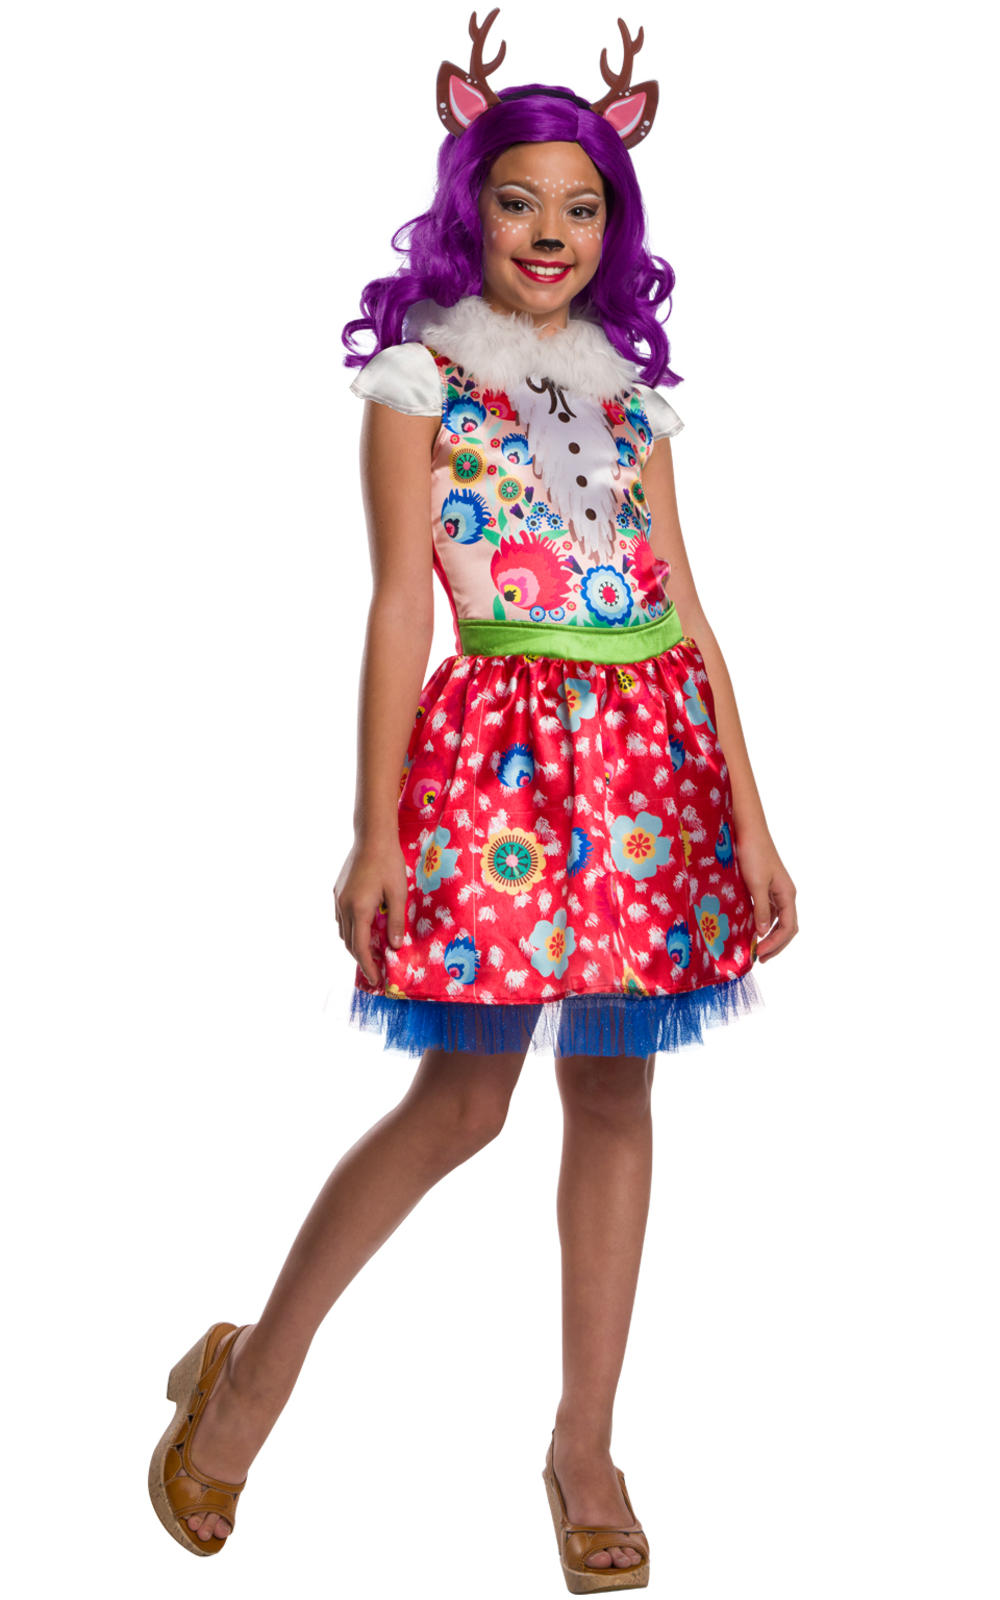 Danessa Deer Girls Fancy Dress Woodland Enchantimals Animal Kids Costume Outfit